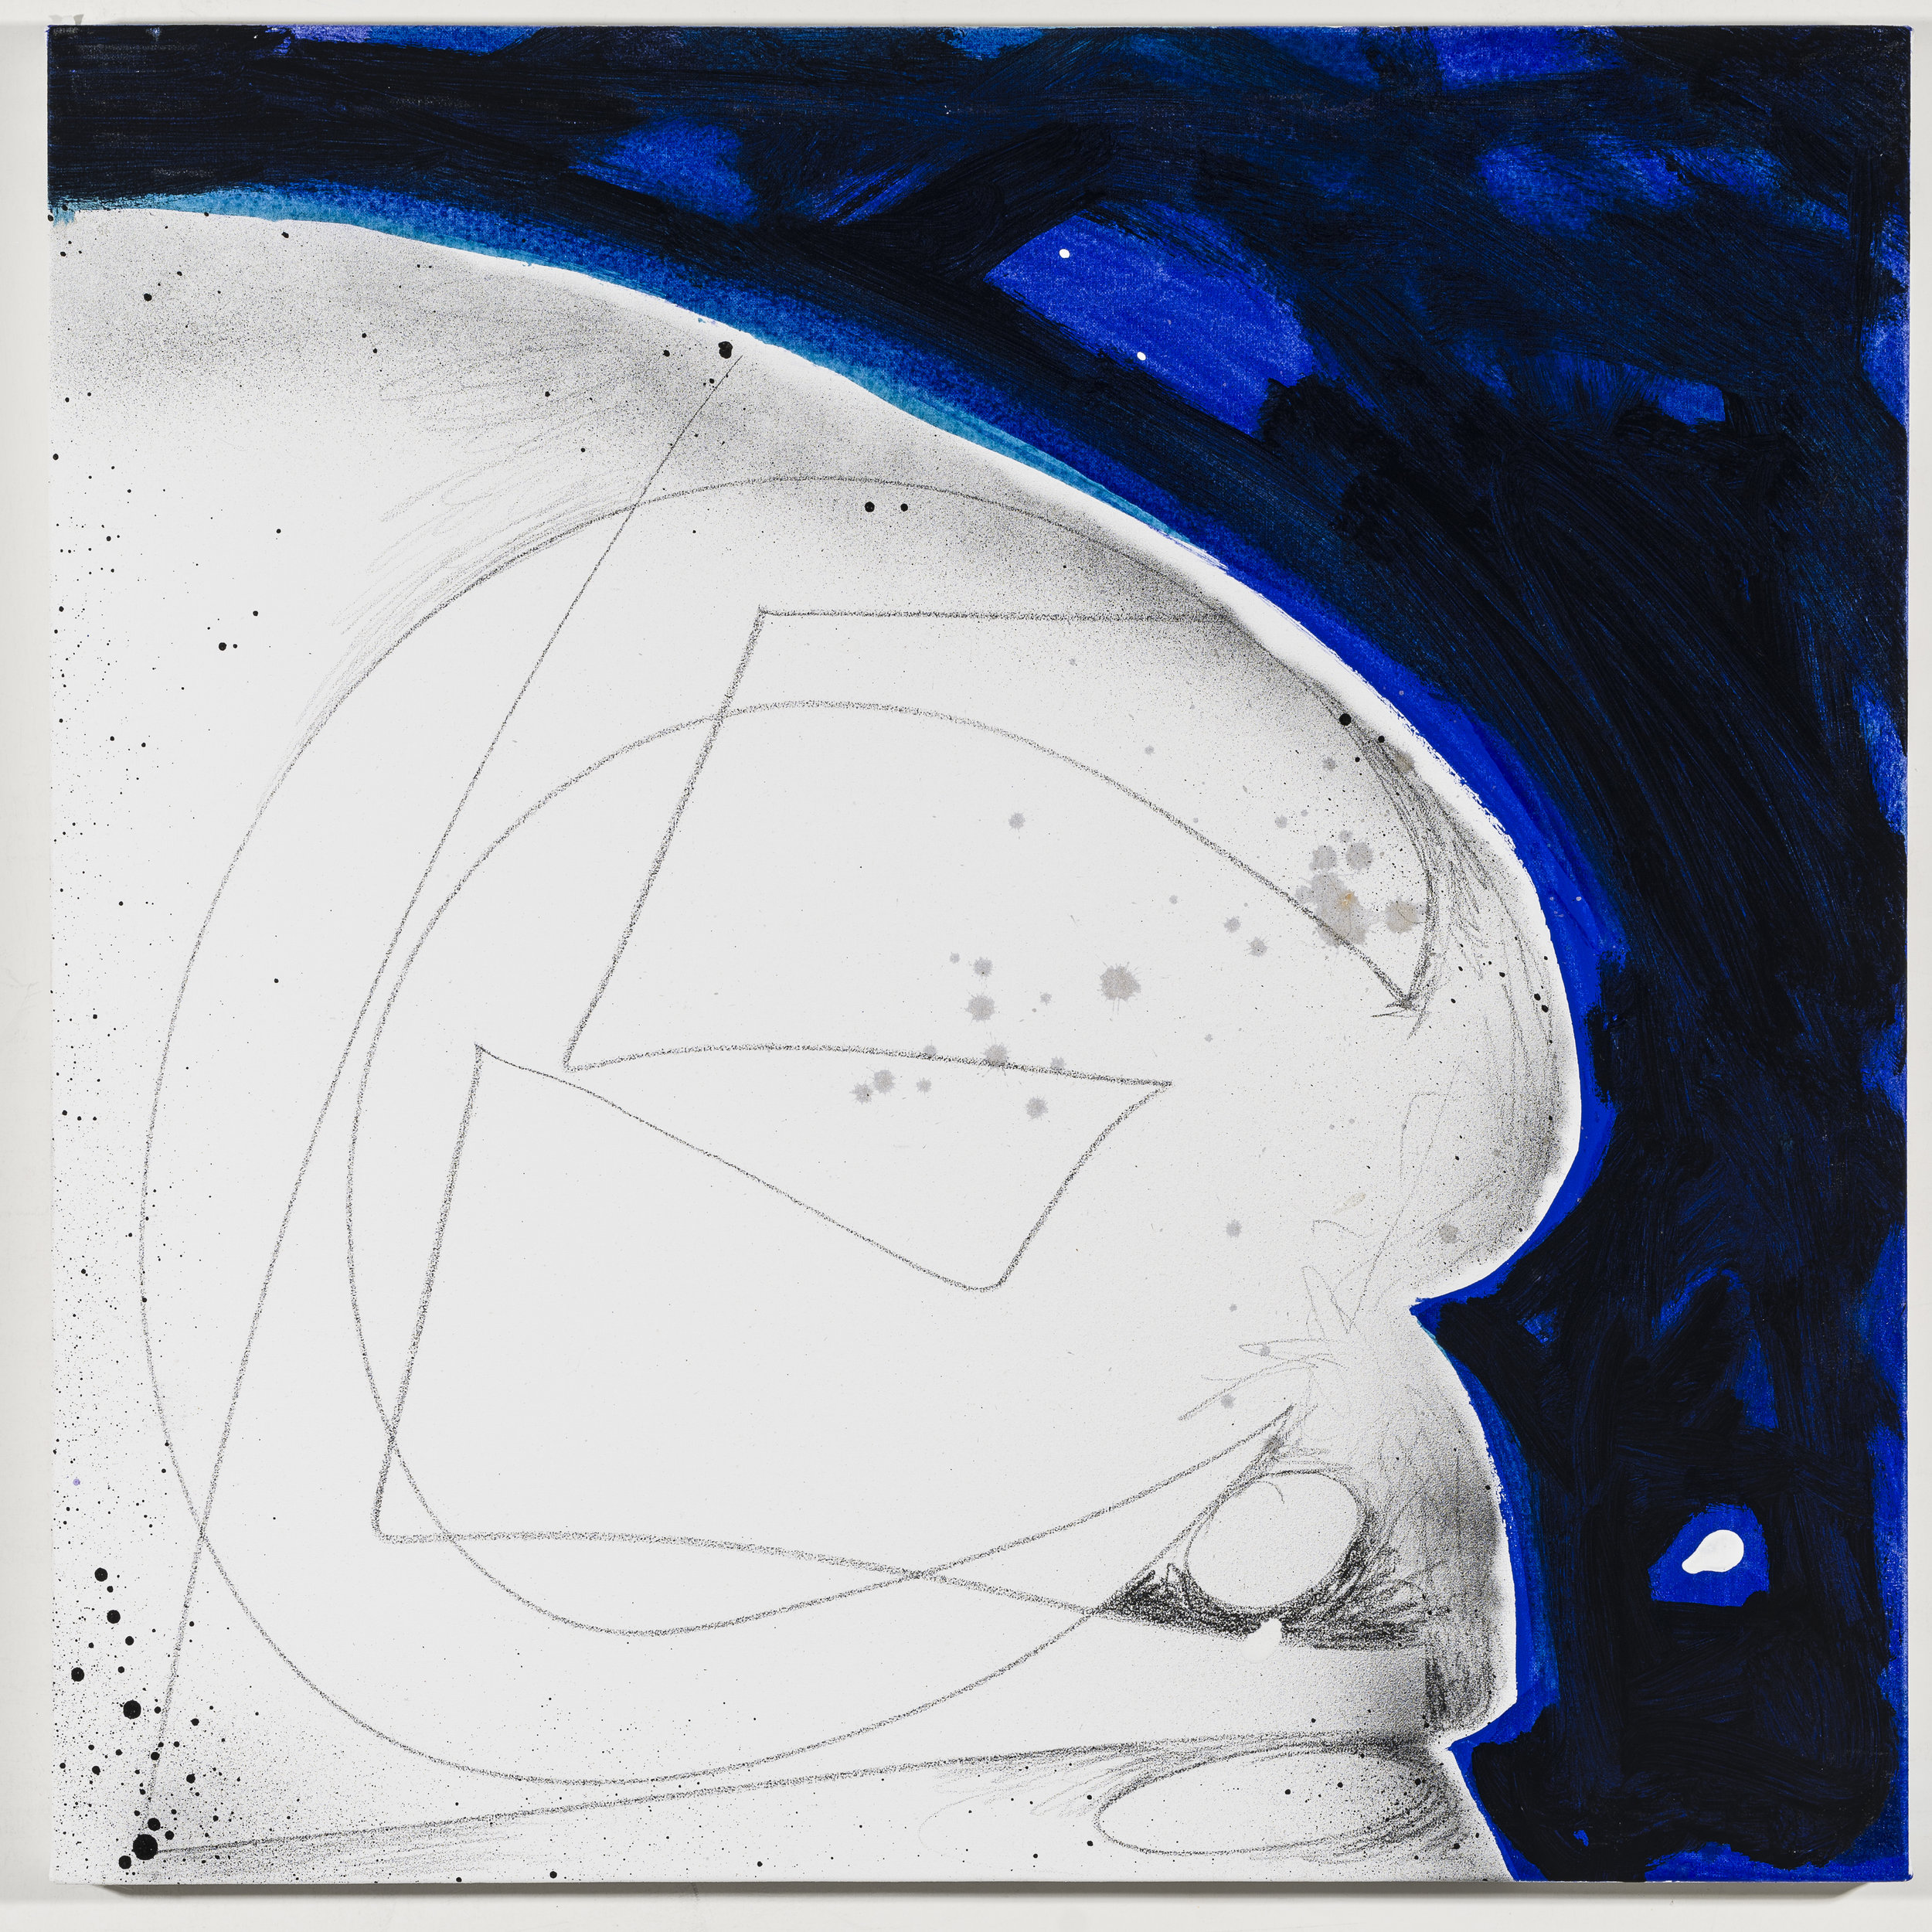 Initials: Cameron Esposito   2018  Graphite and acrylic on canvas  20 x 20 inches; 51 x 51 cm